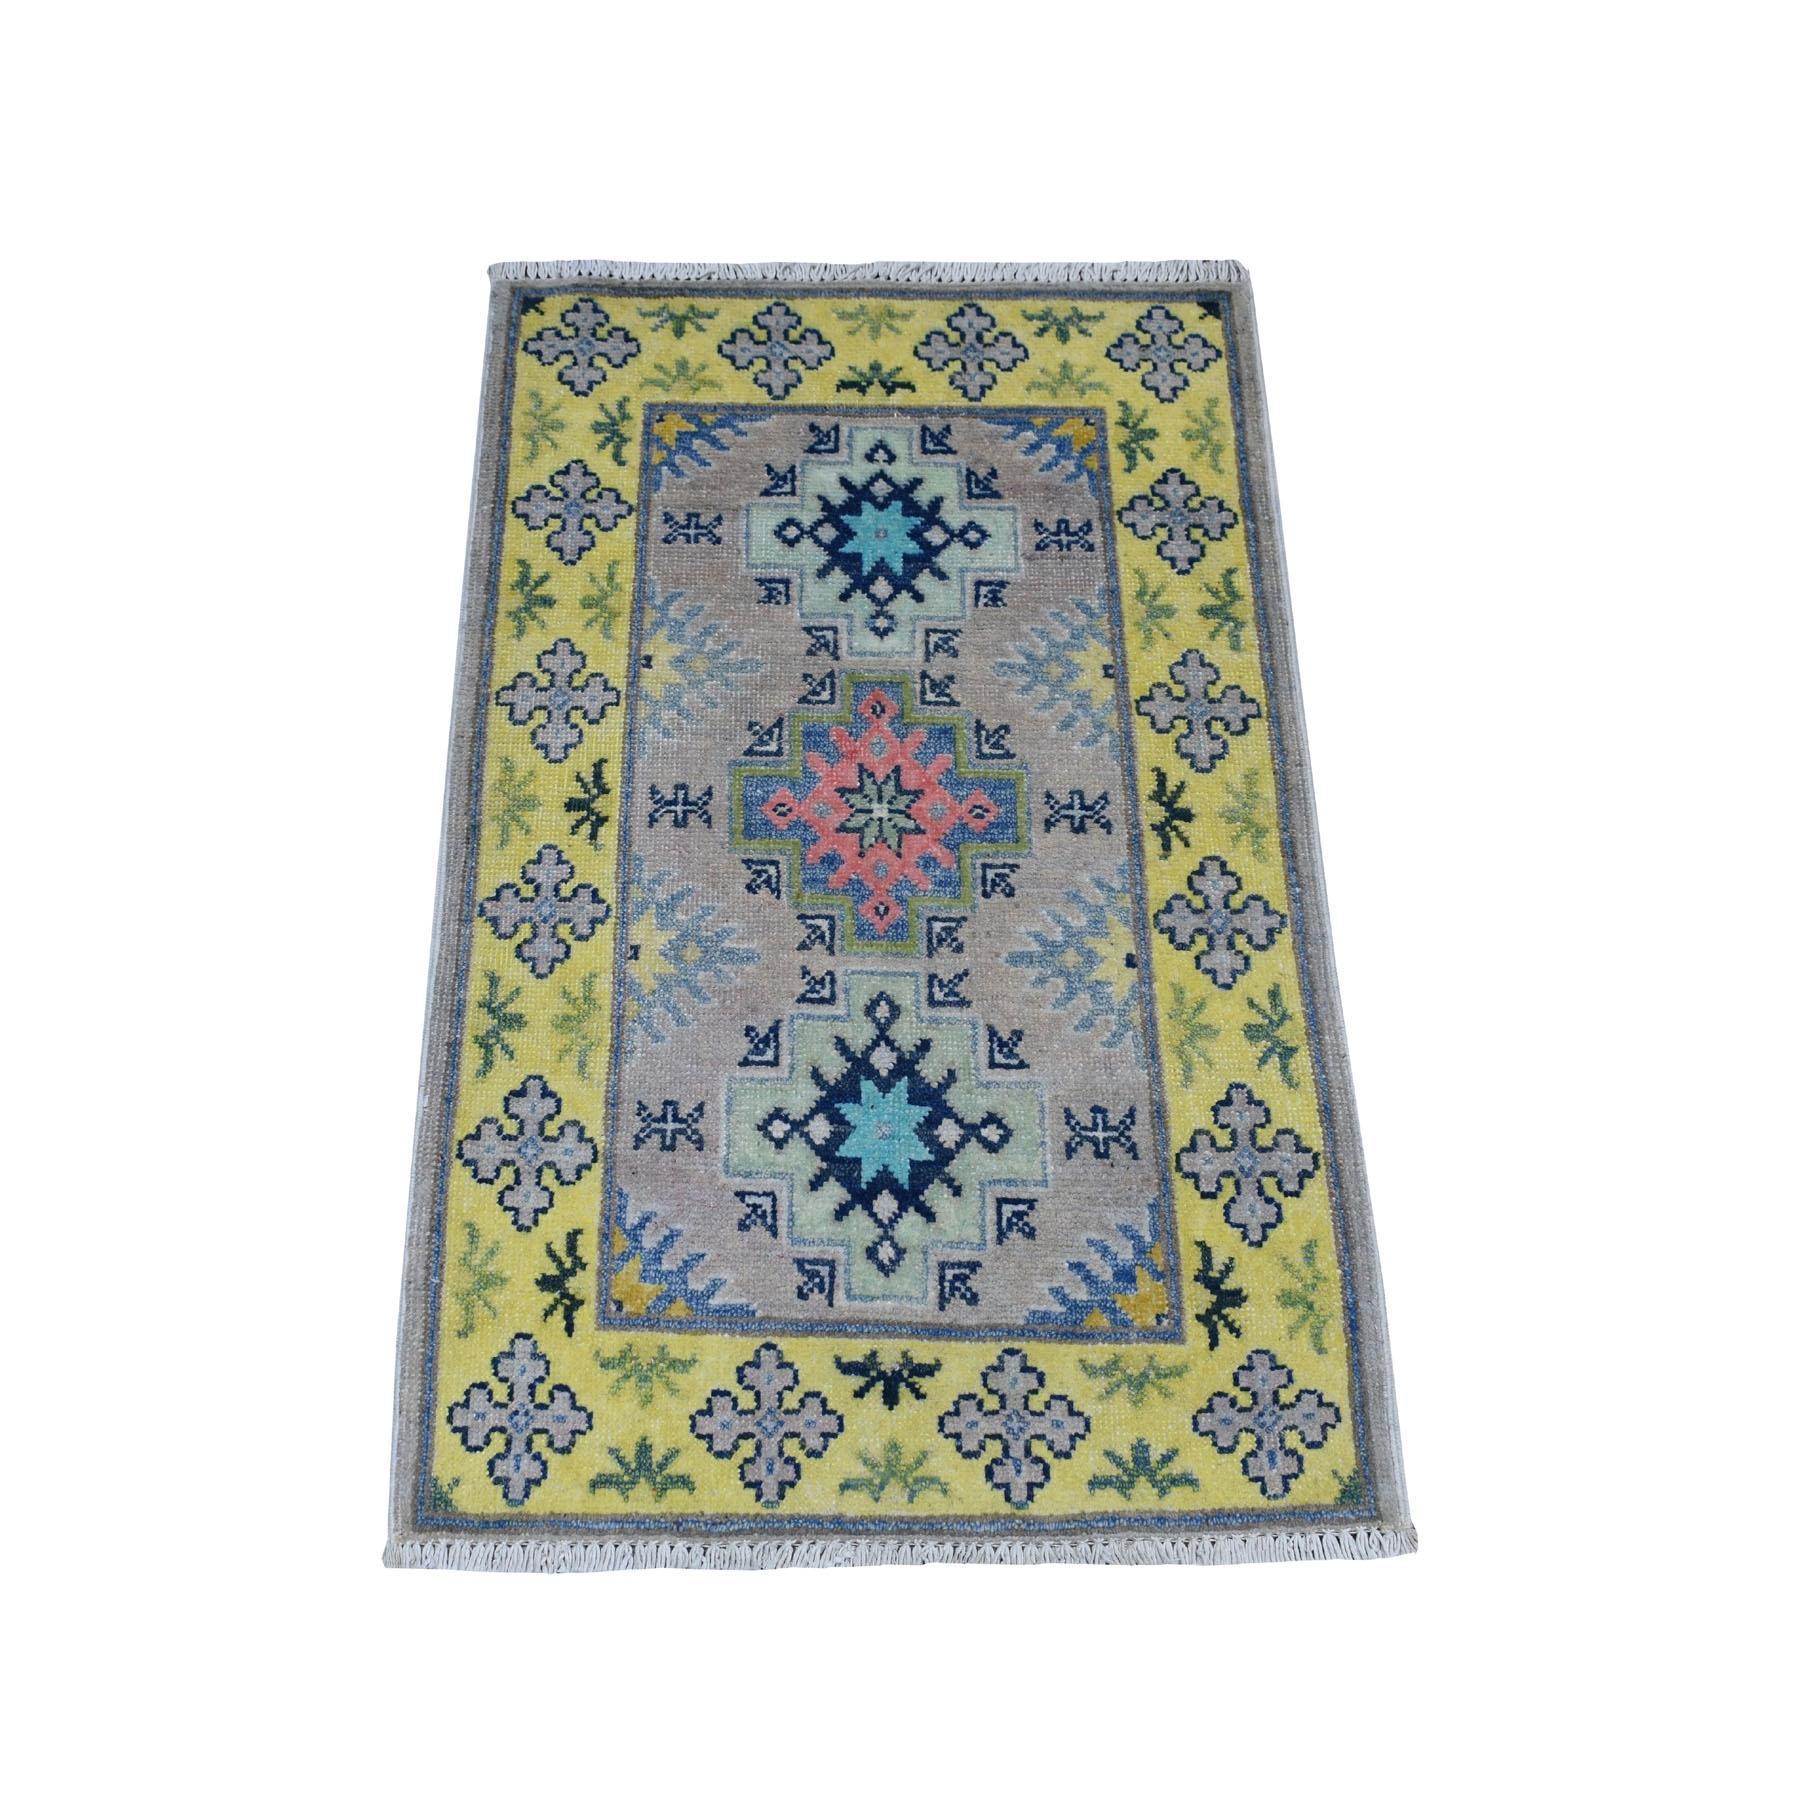 2'X3' Colorful Gray Fusion Kazak Pure Wool Geometric Design Hand Knotted Oriental Rug moaebc87